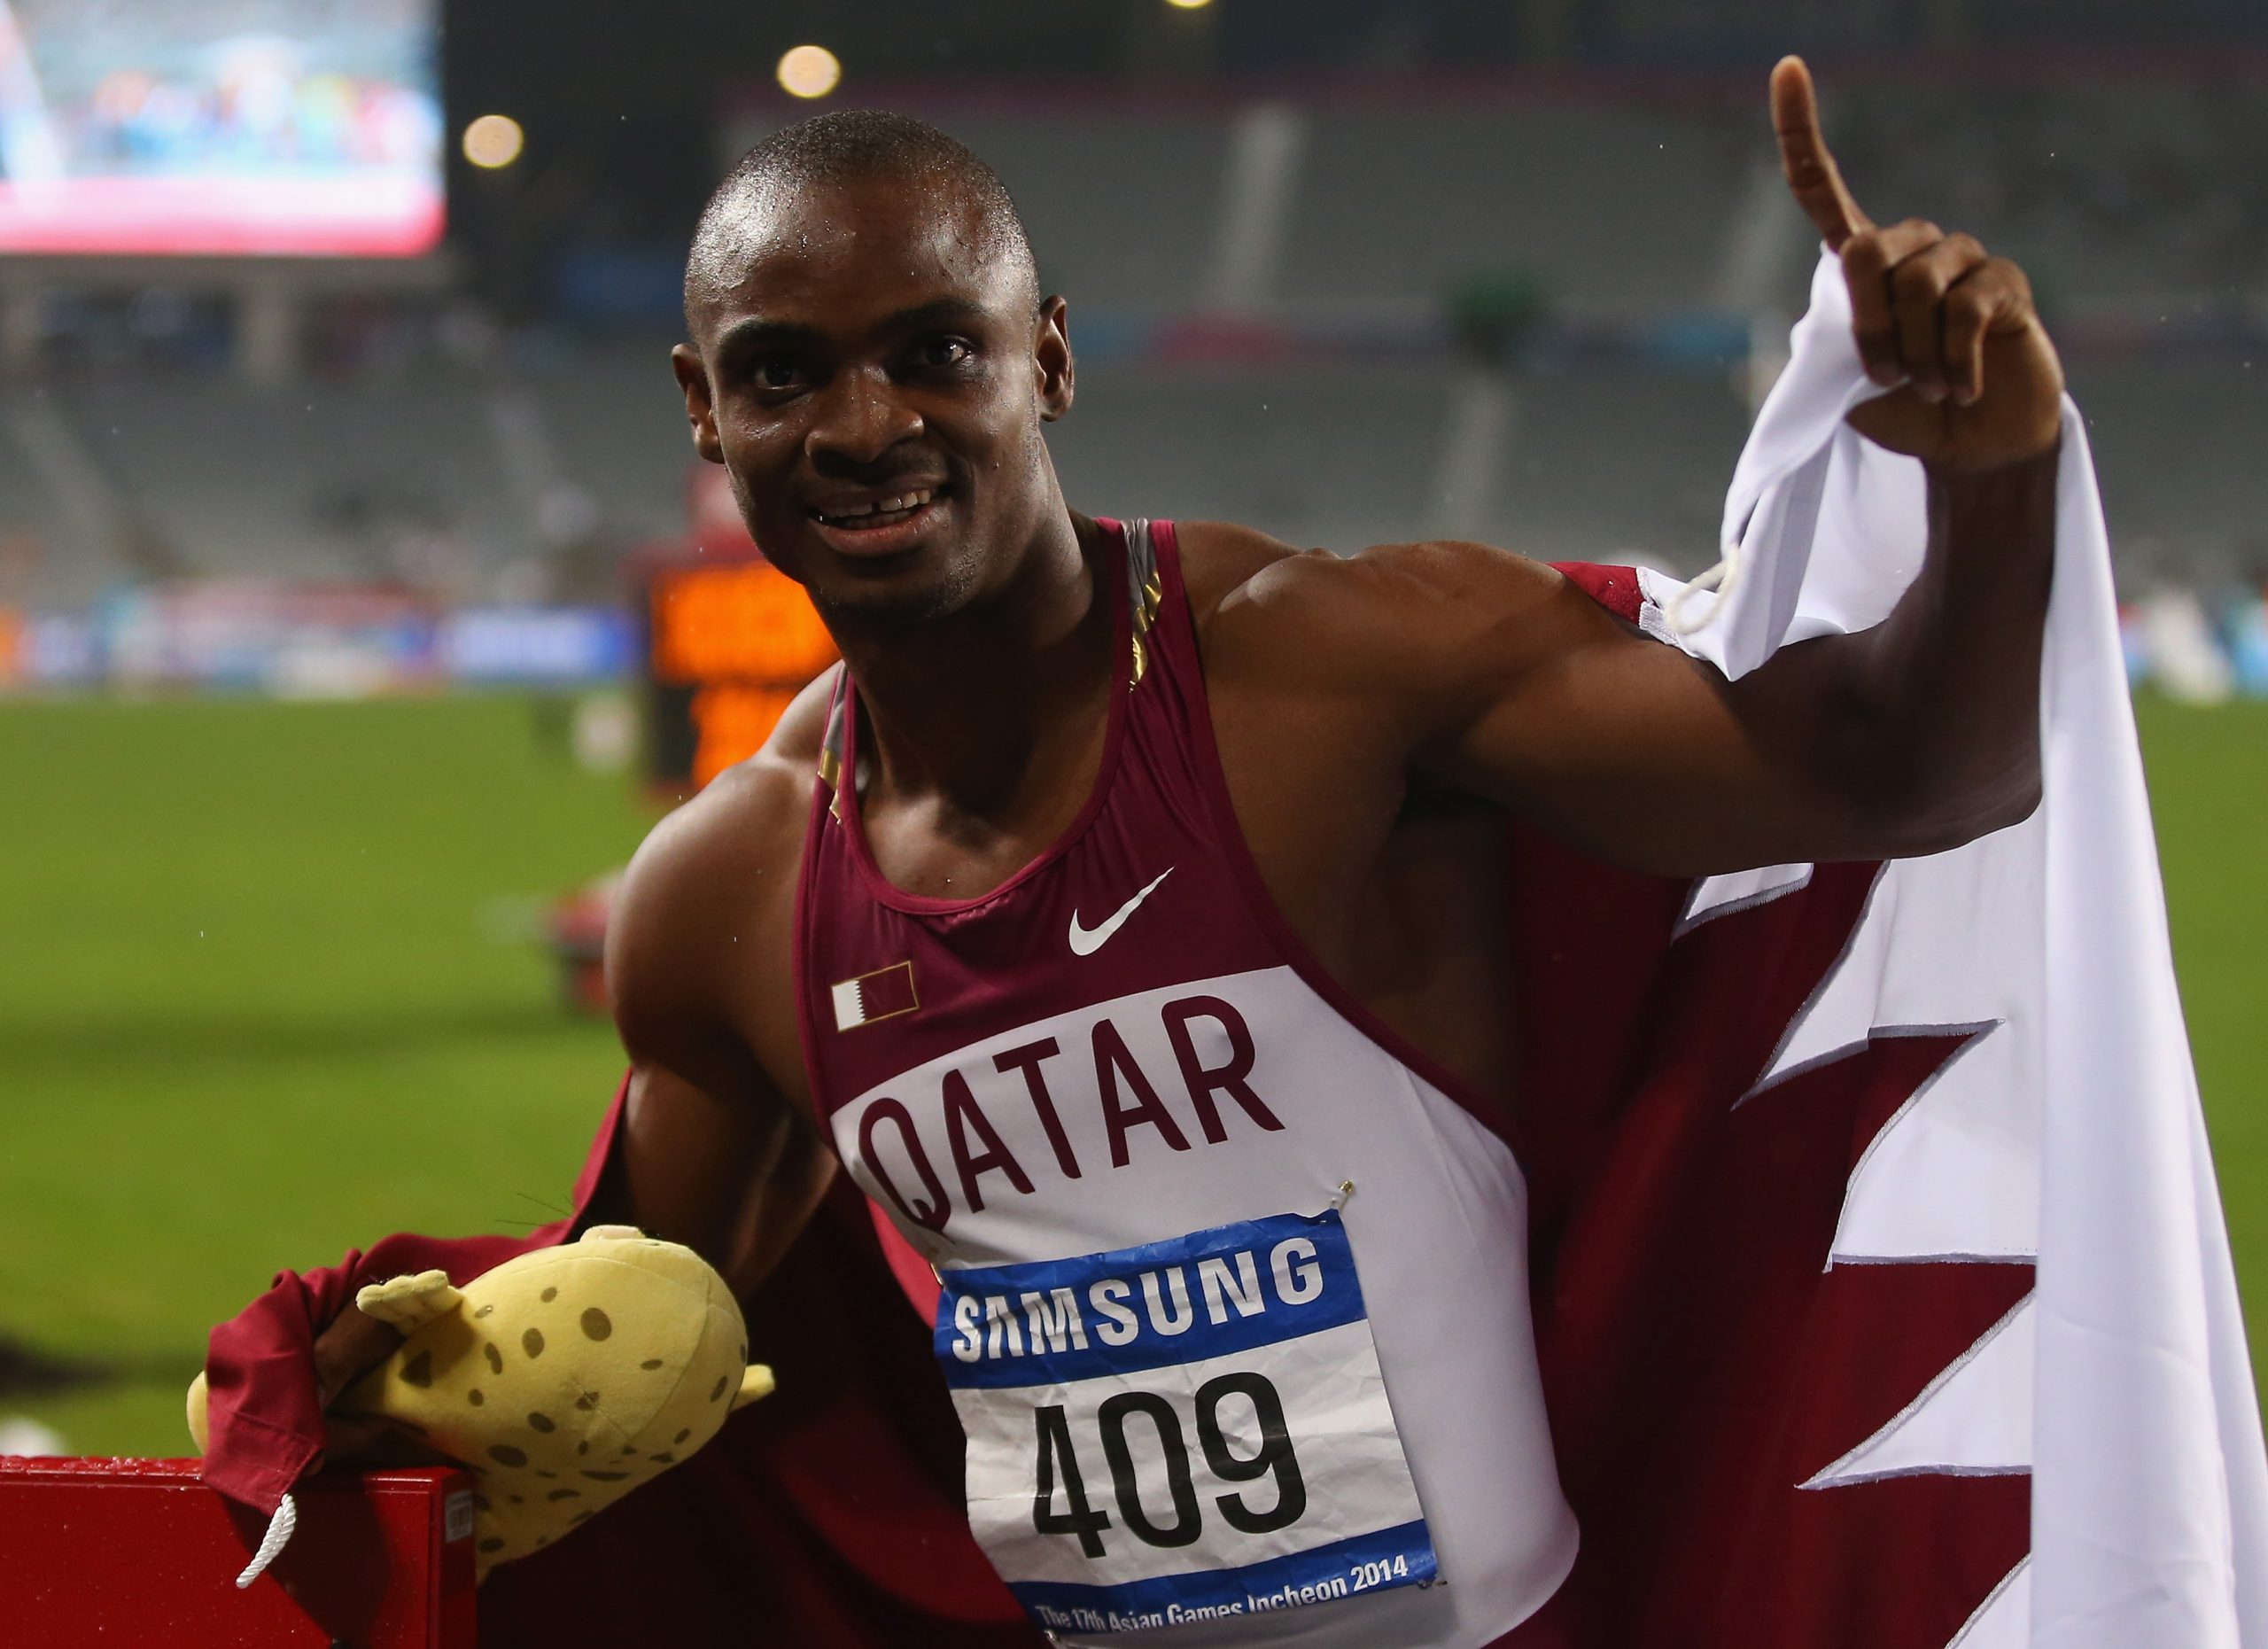 Qatar's Ogunode Wins 100m Race in Arab Athletics Championships